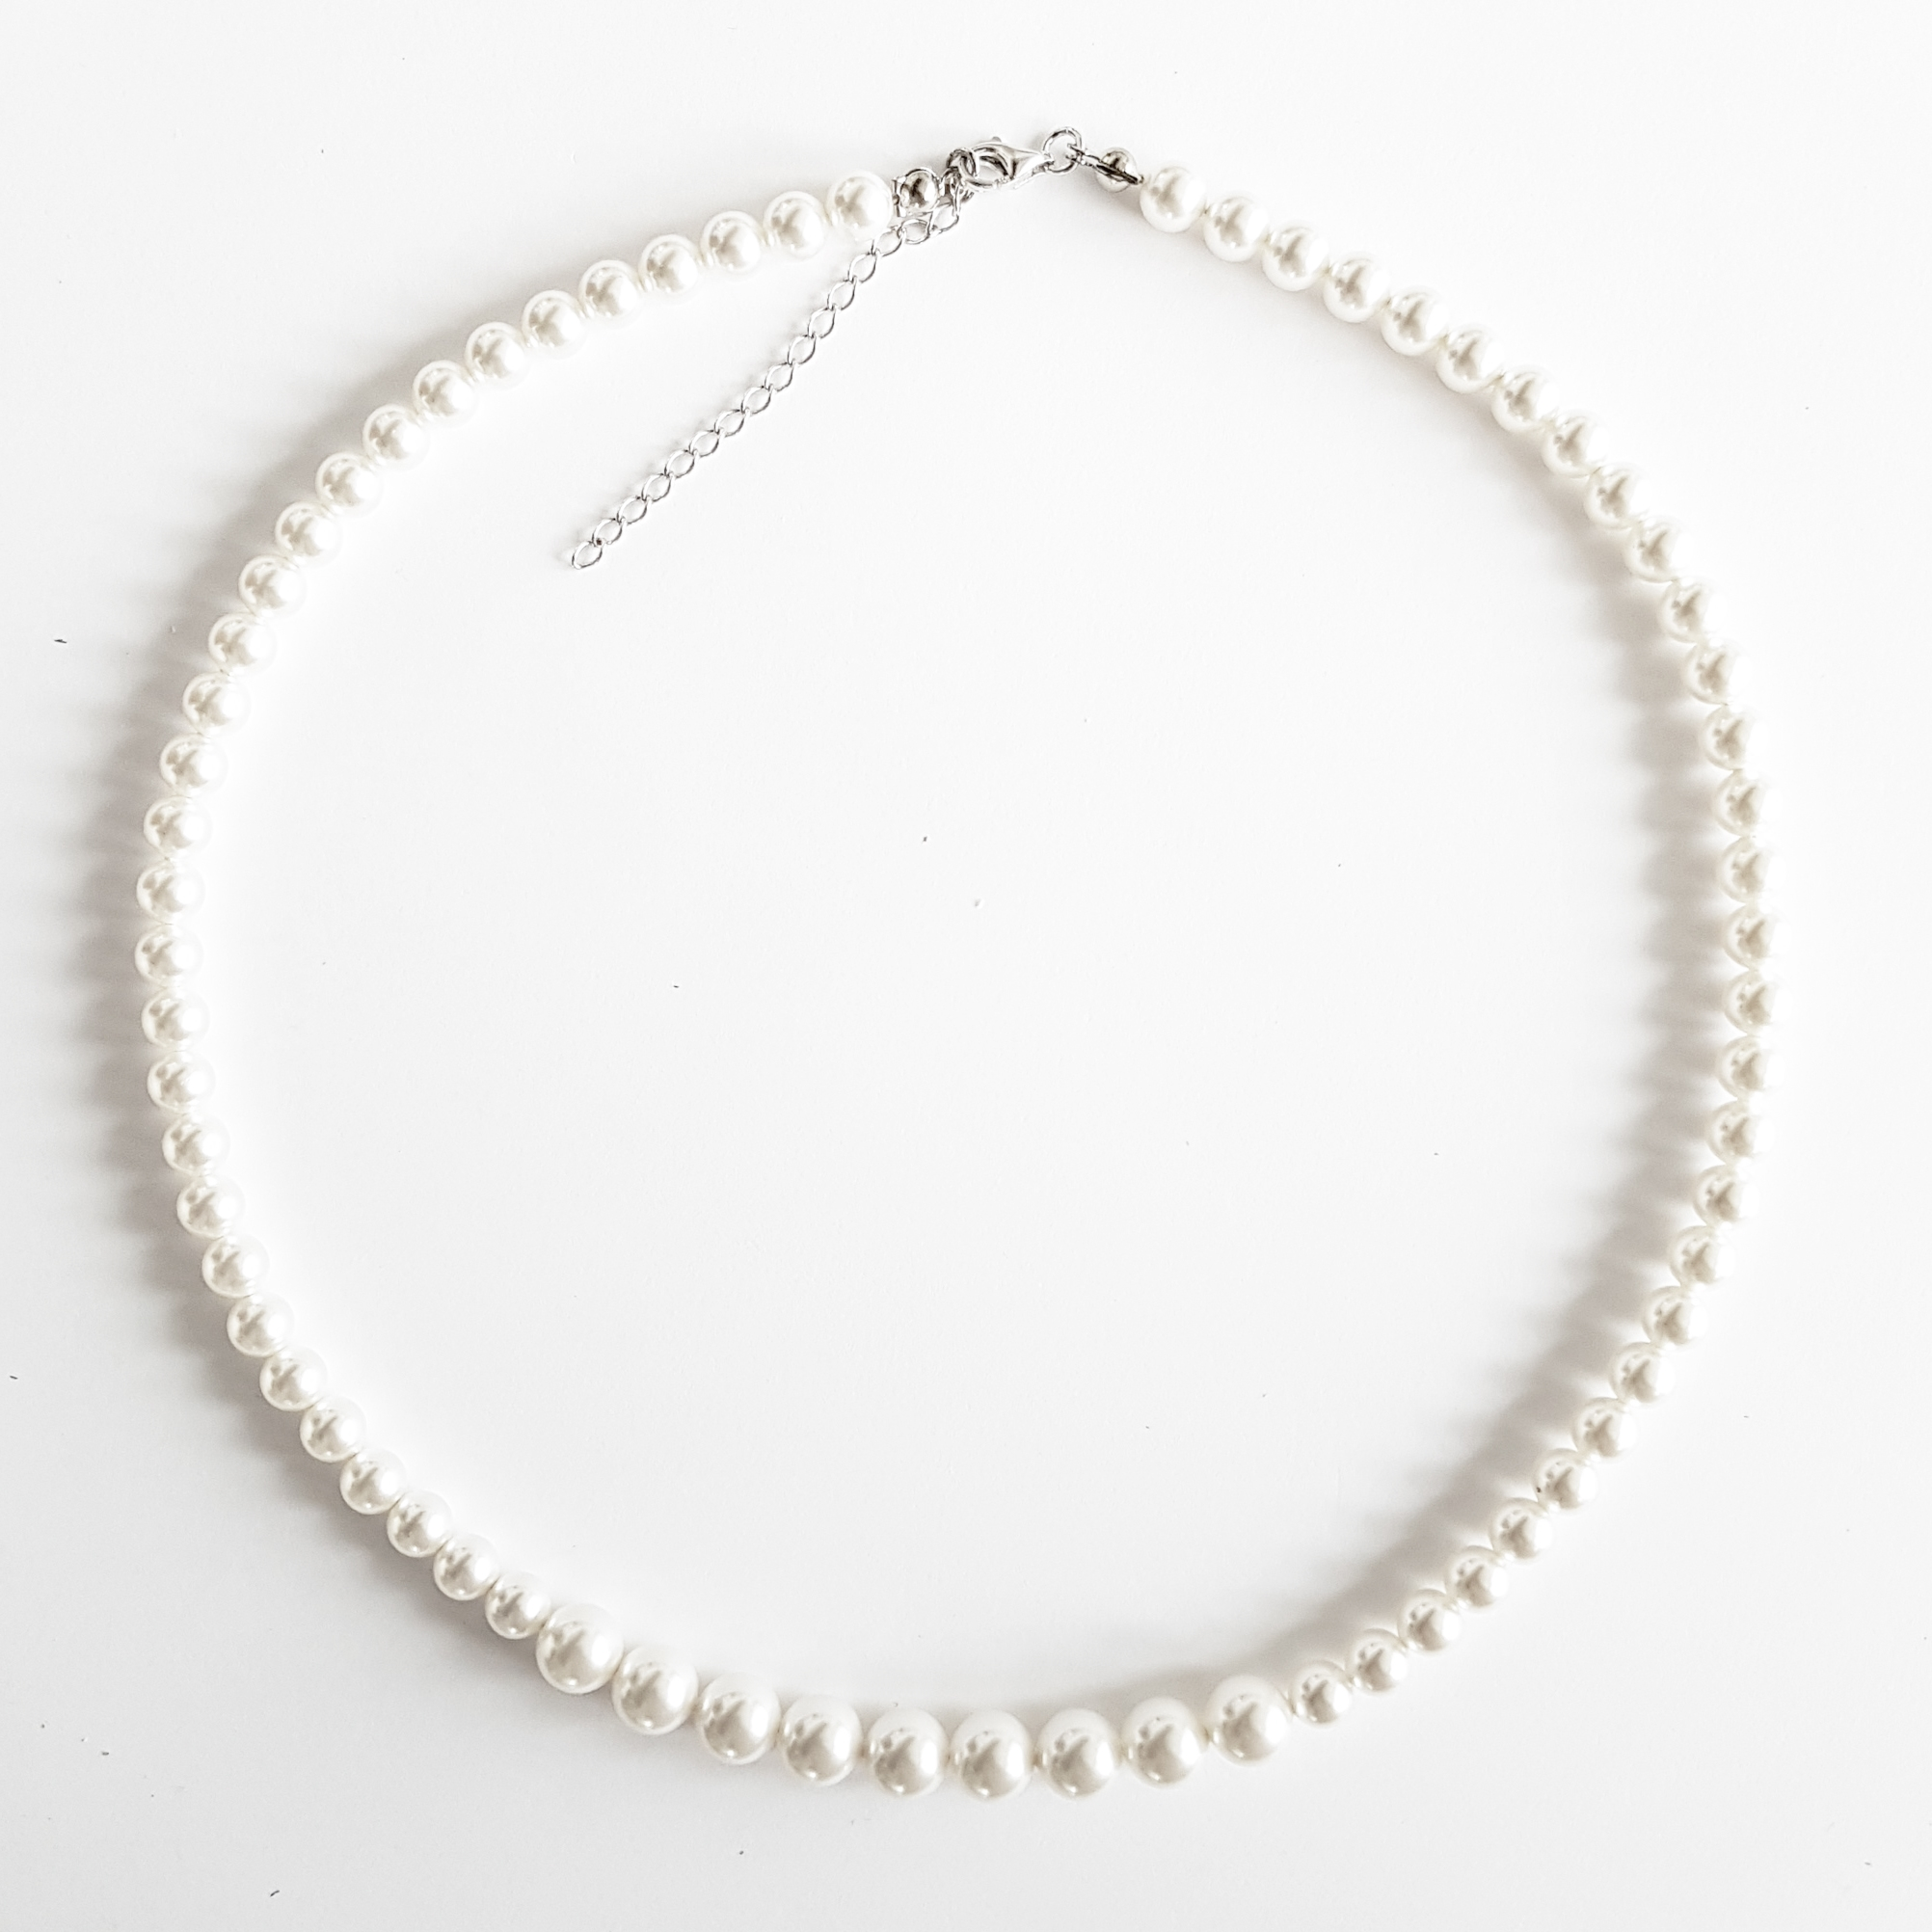 Perlový náhrdelník s bielymi perlami Crystals from Swarovski ®